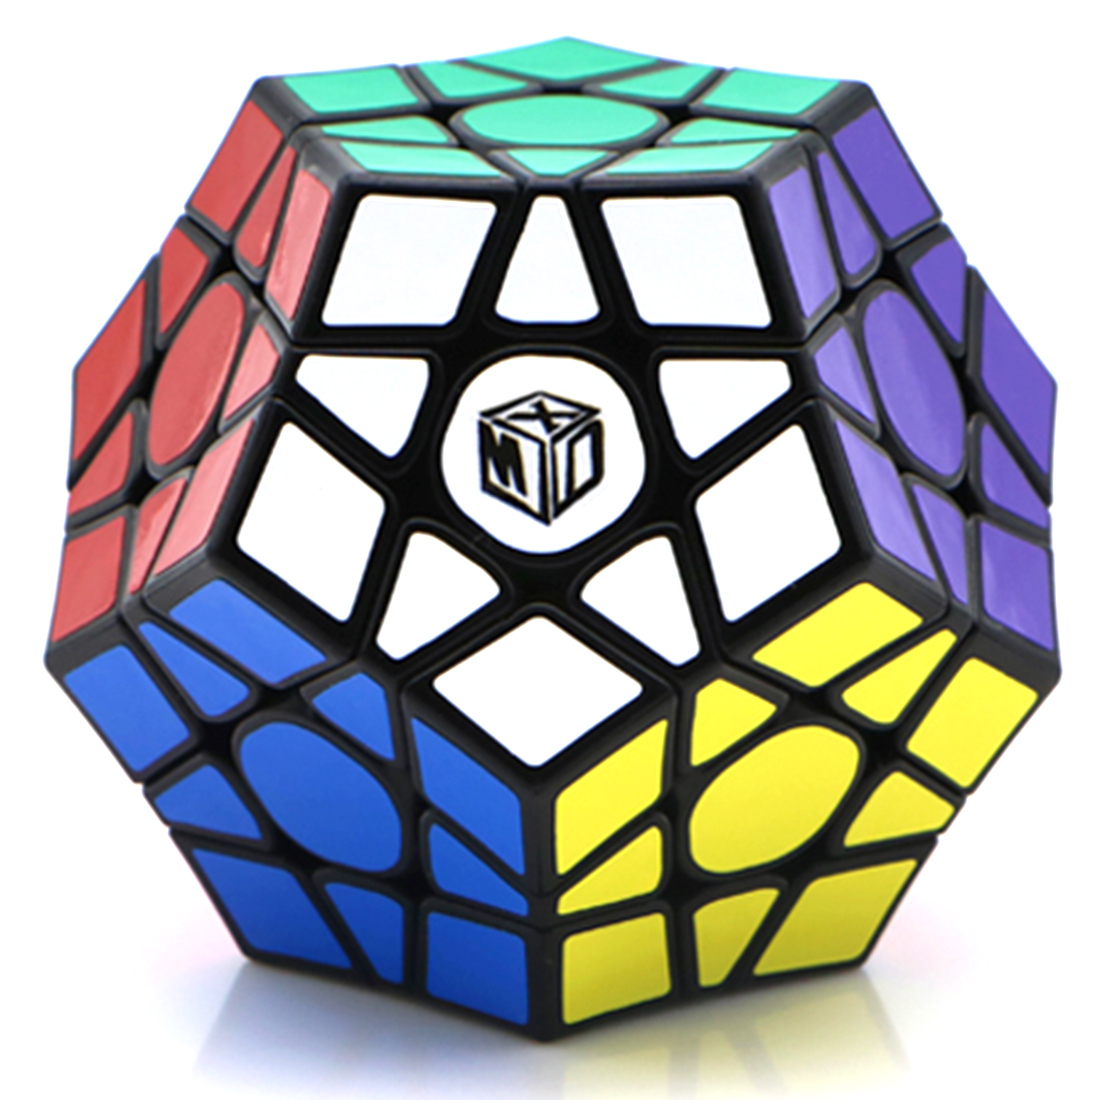 Qiyi Galaxy V2 Magie Cube Gehirn Teaser Puzzle Spielzeug (Konkaven Typ)-Schwarz-basis